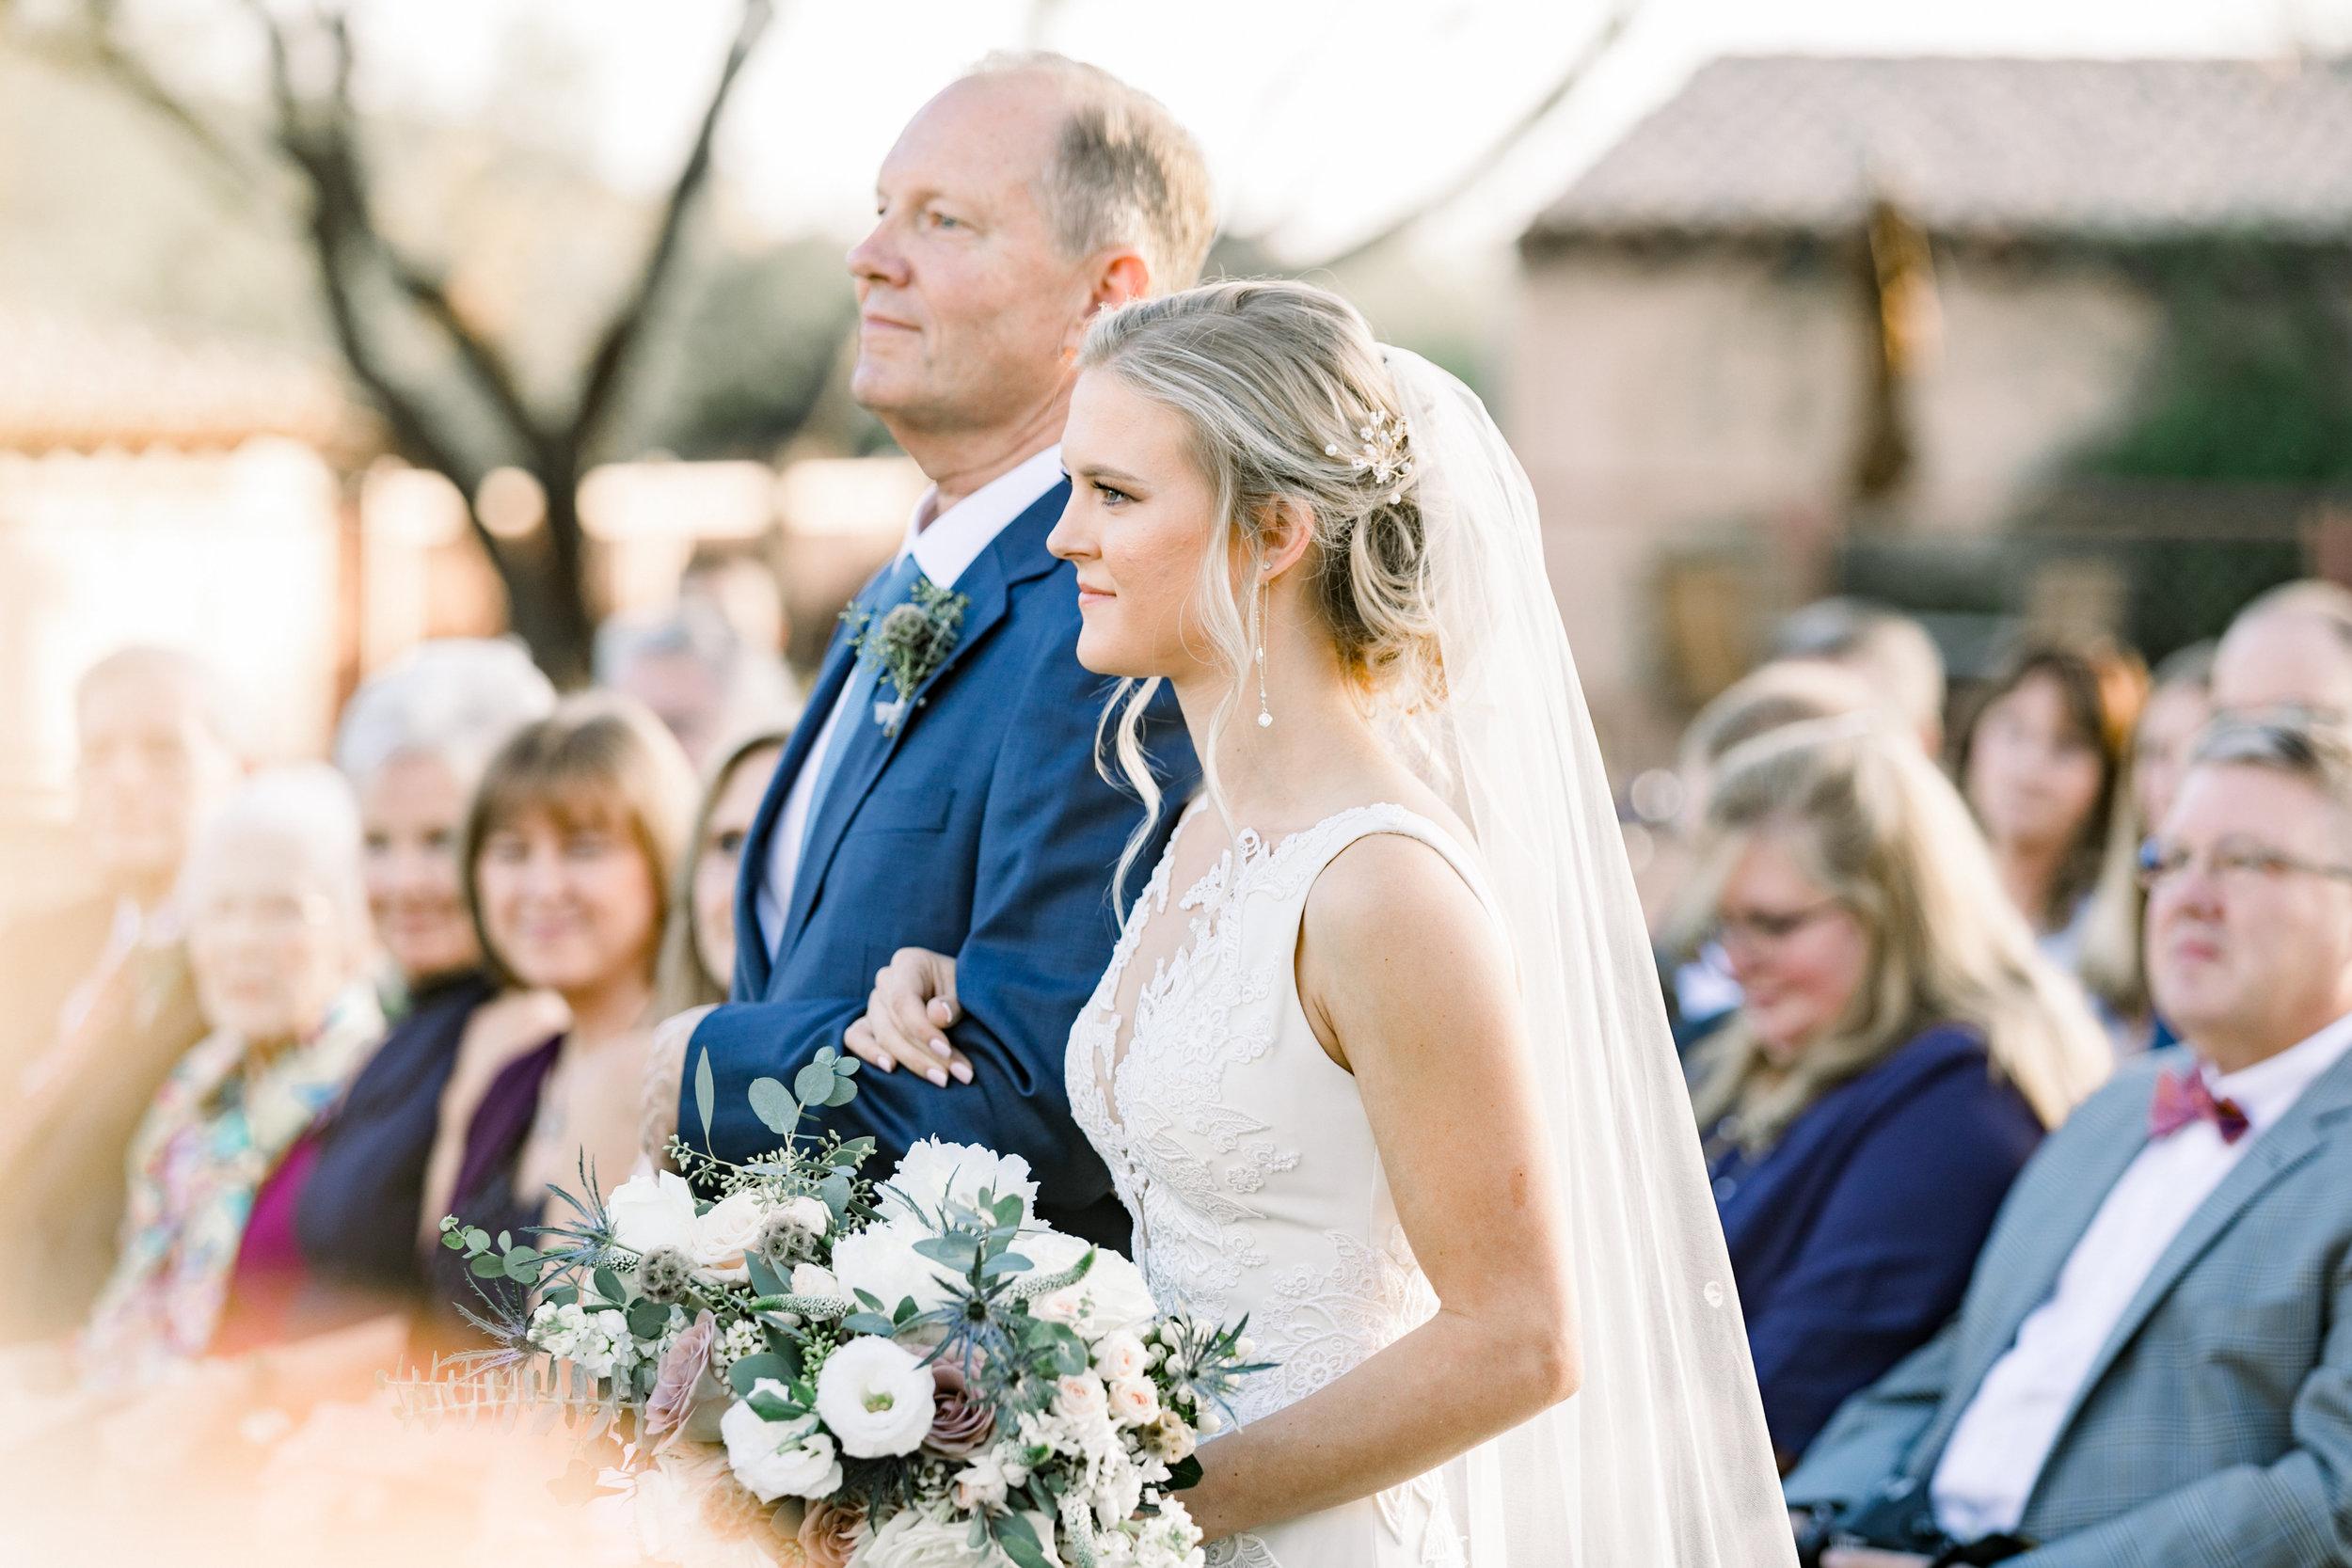 Lukas Wedding - Details-43.jpg